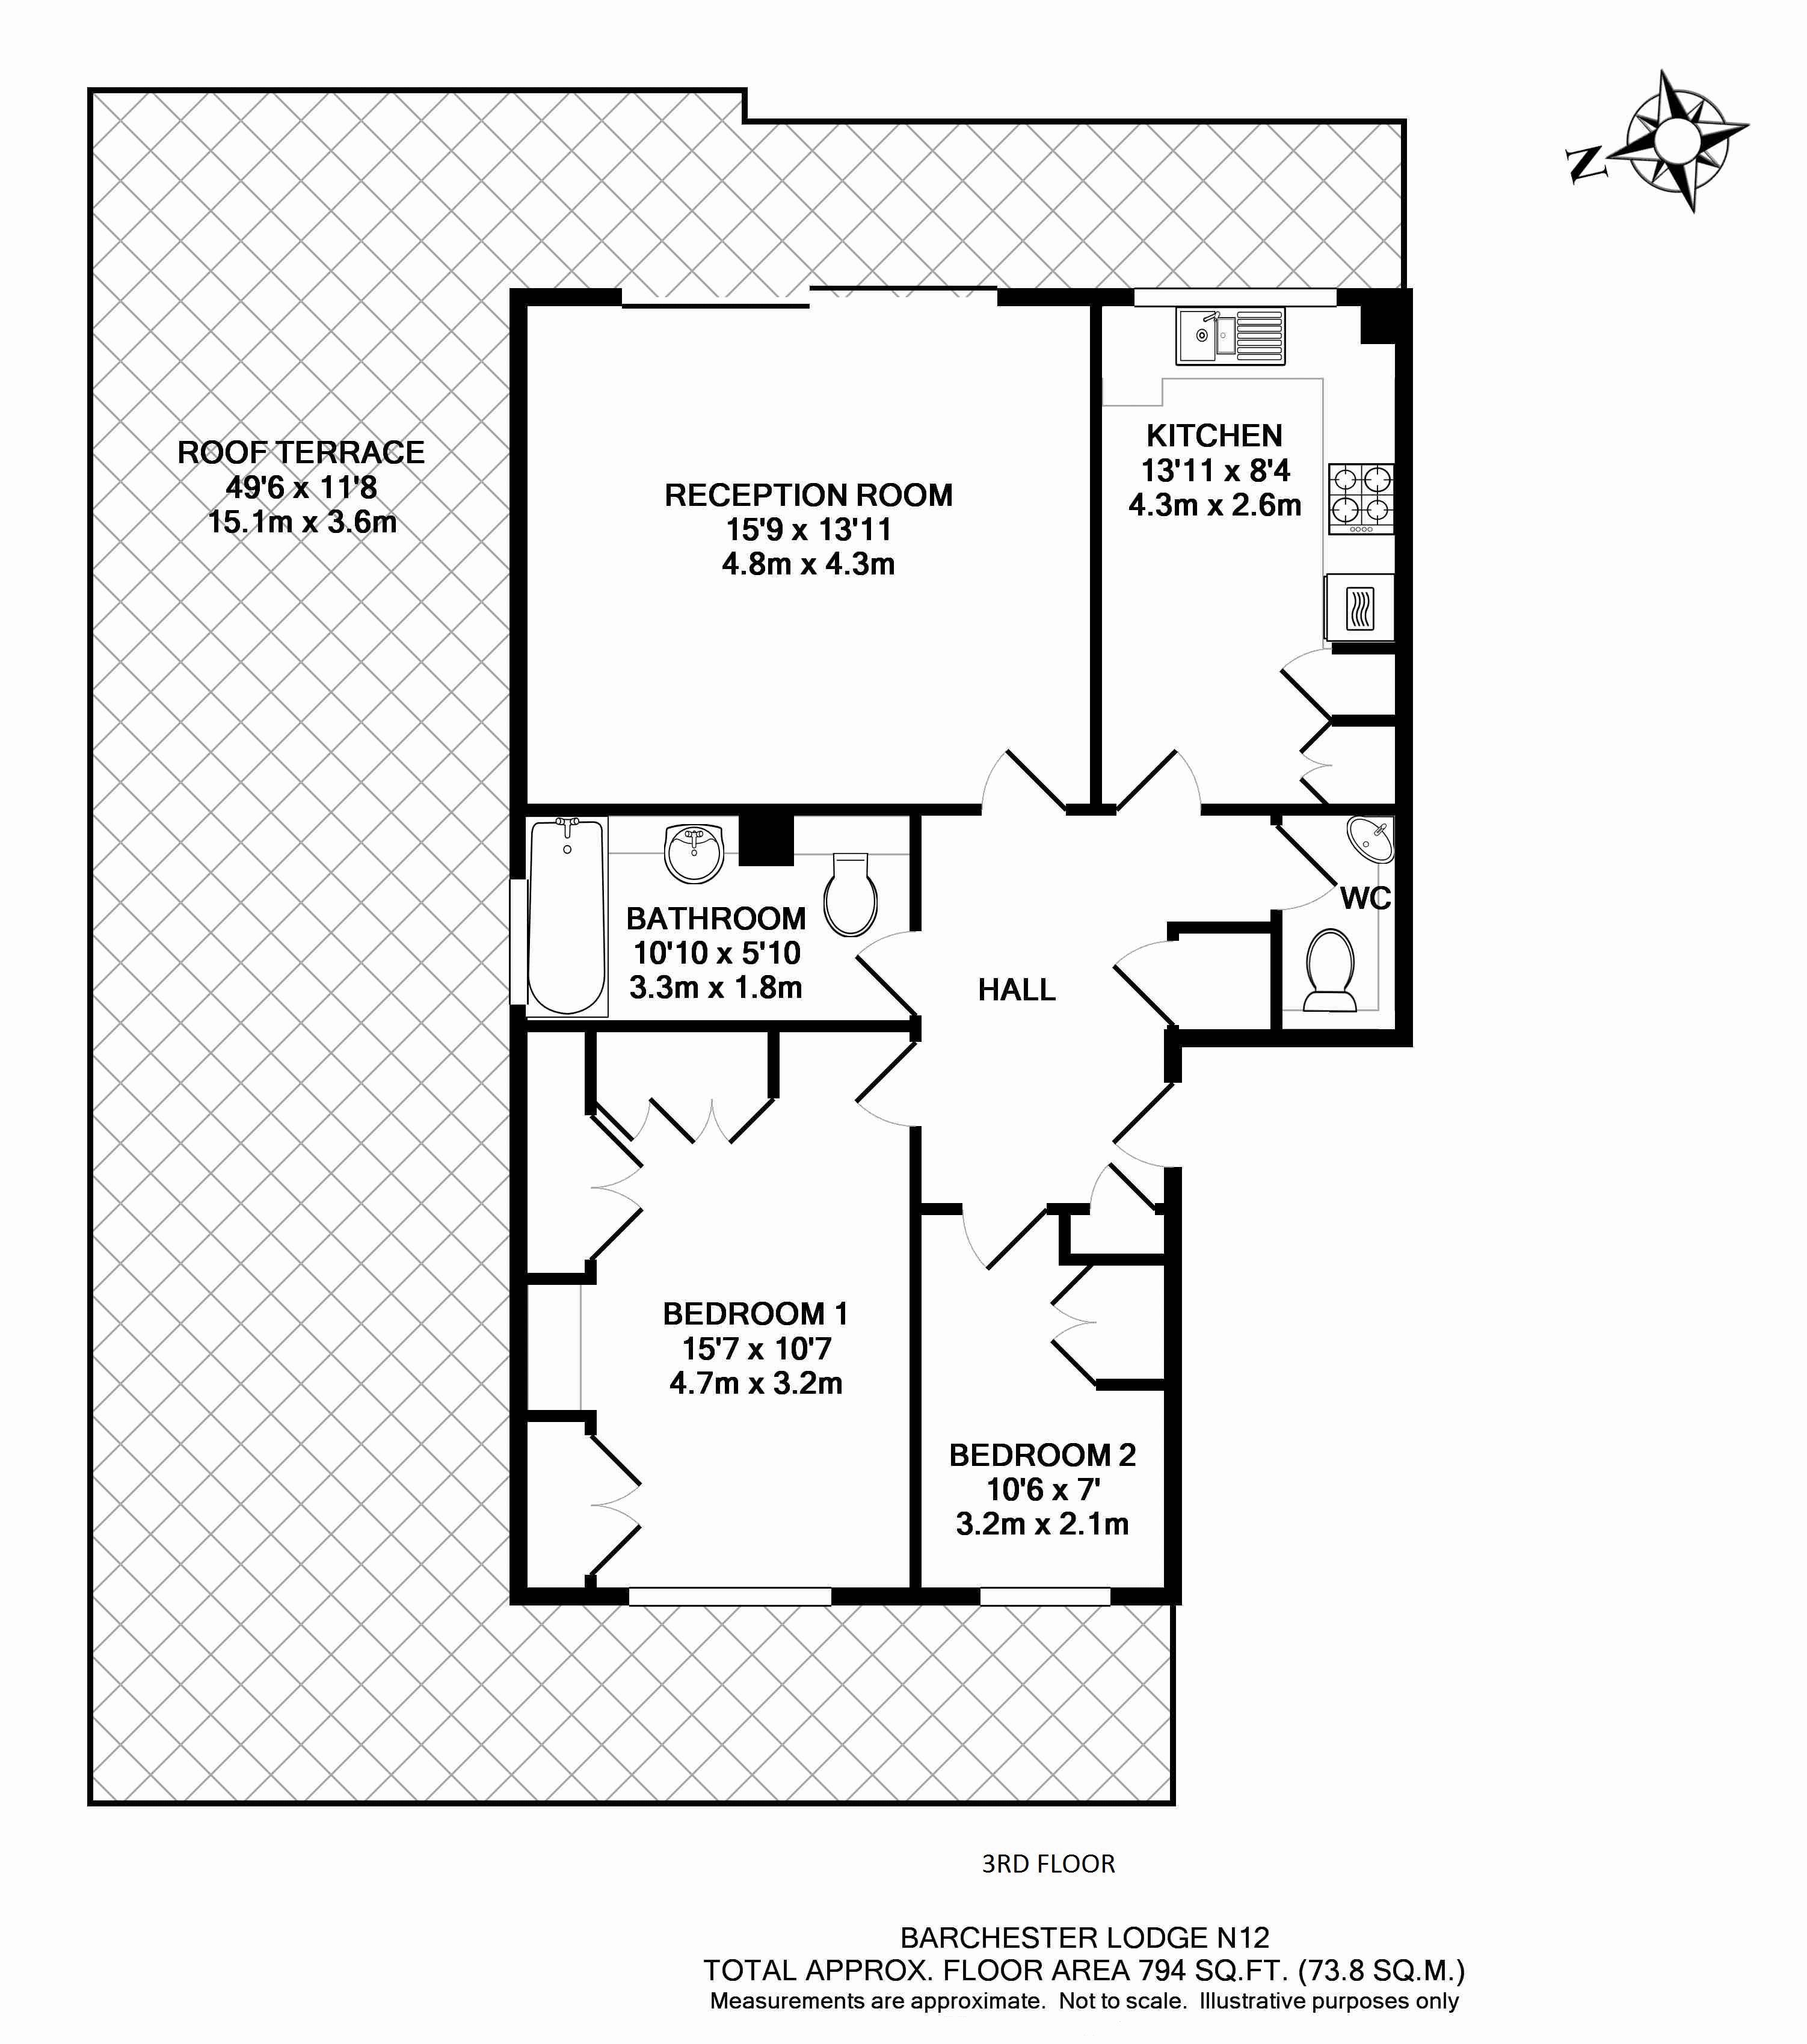 14 Barchester Lodge - Floorplan